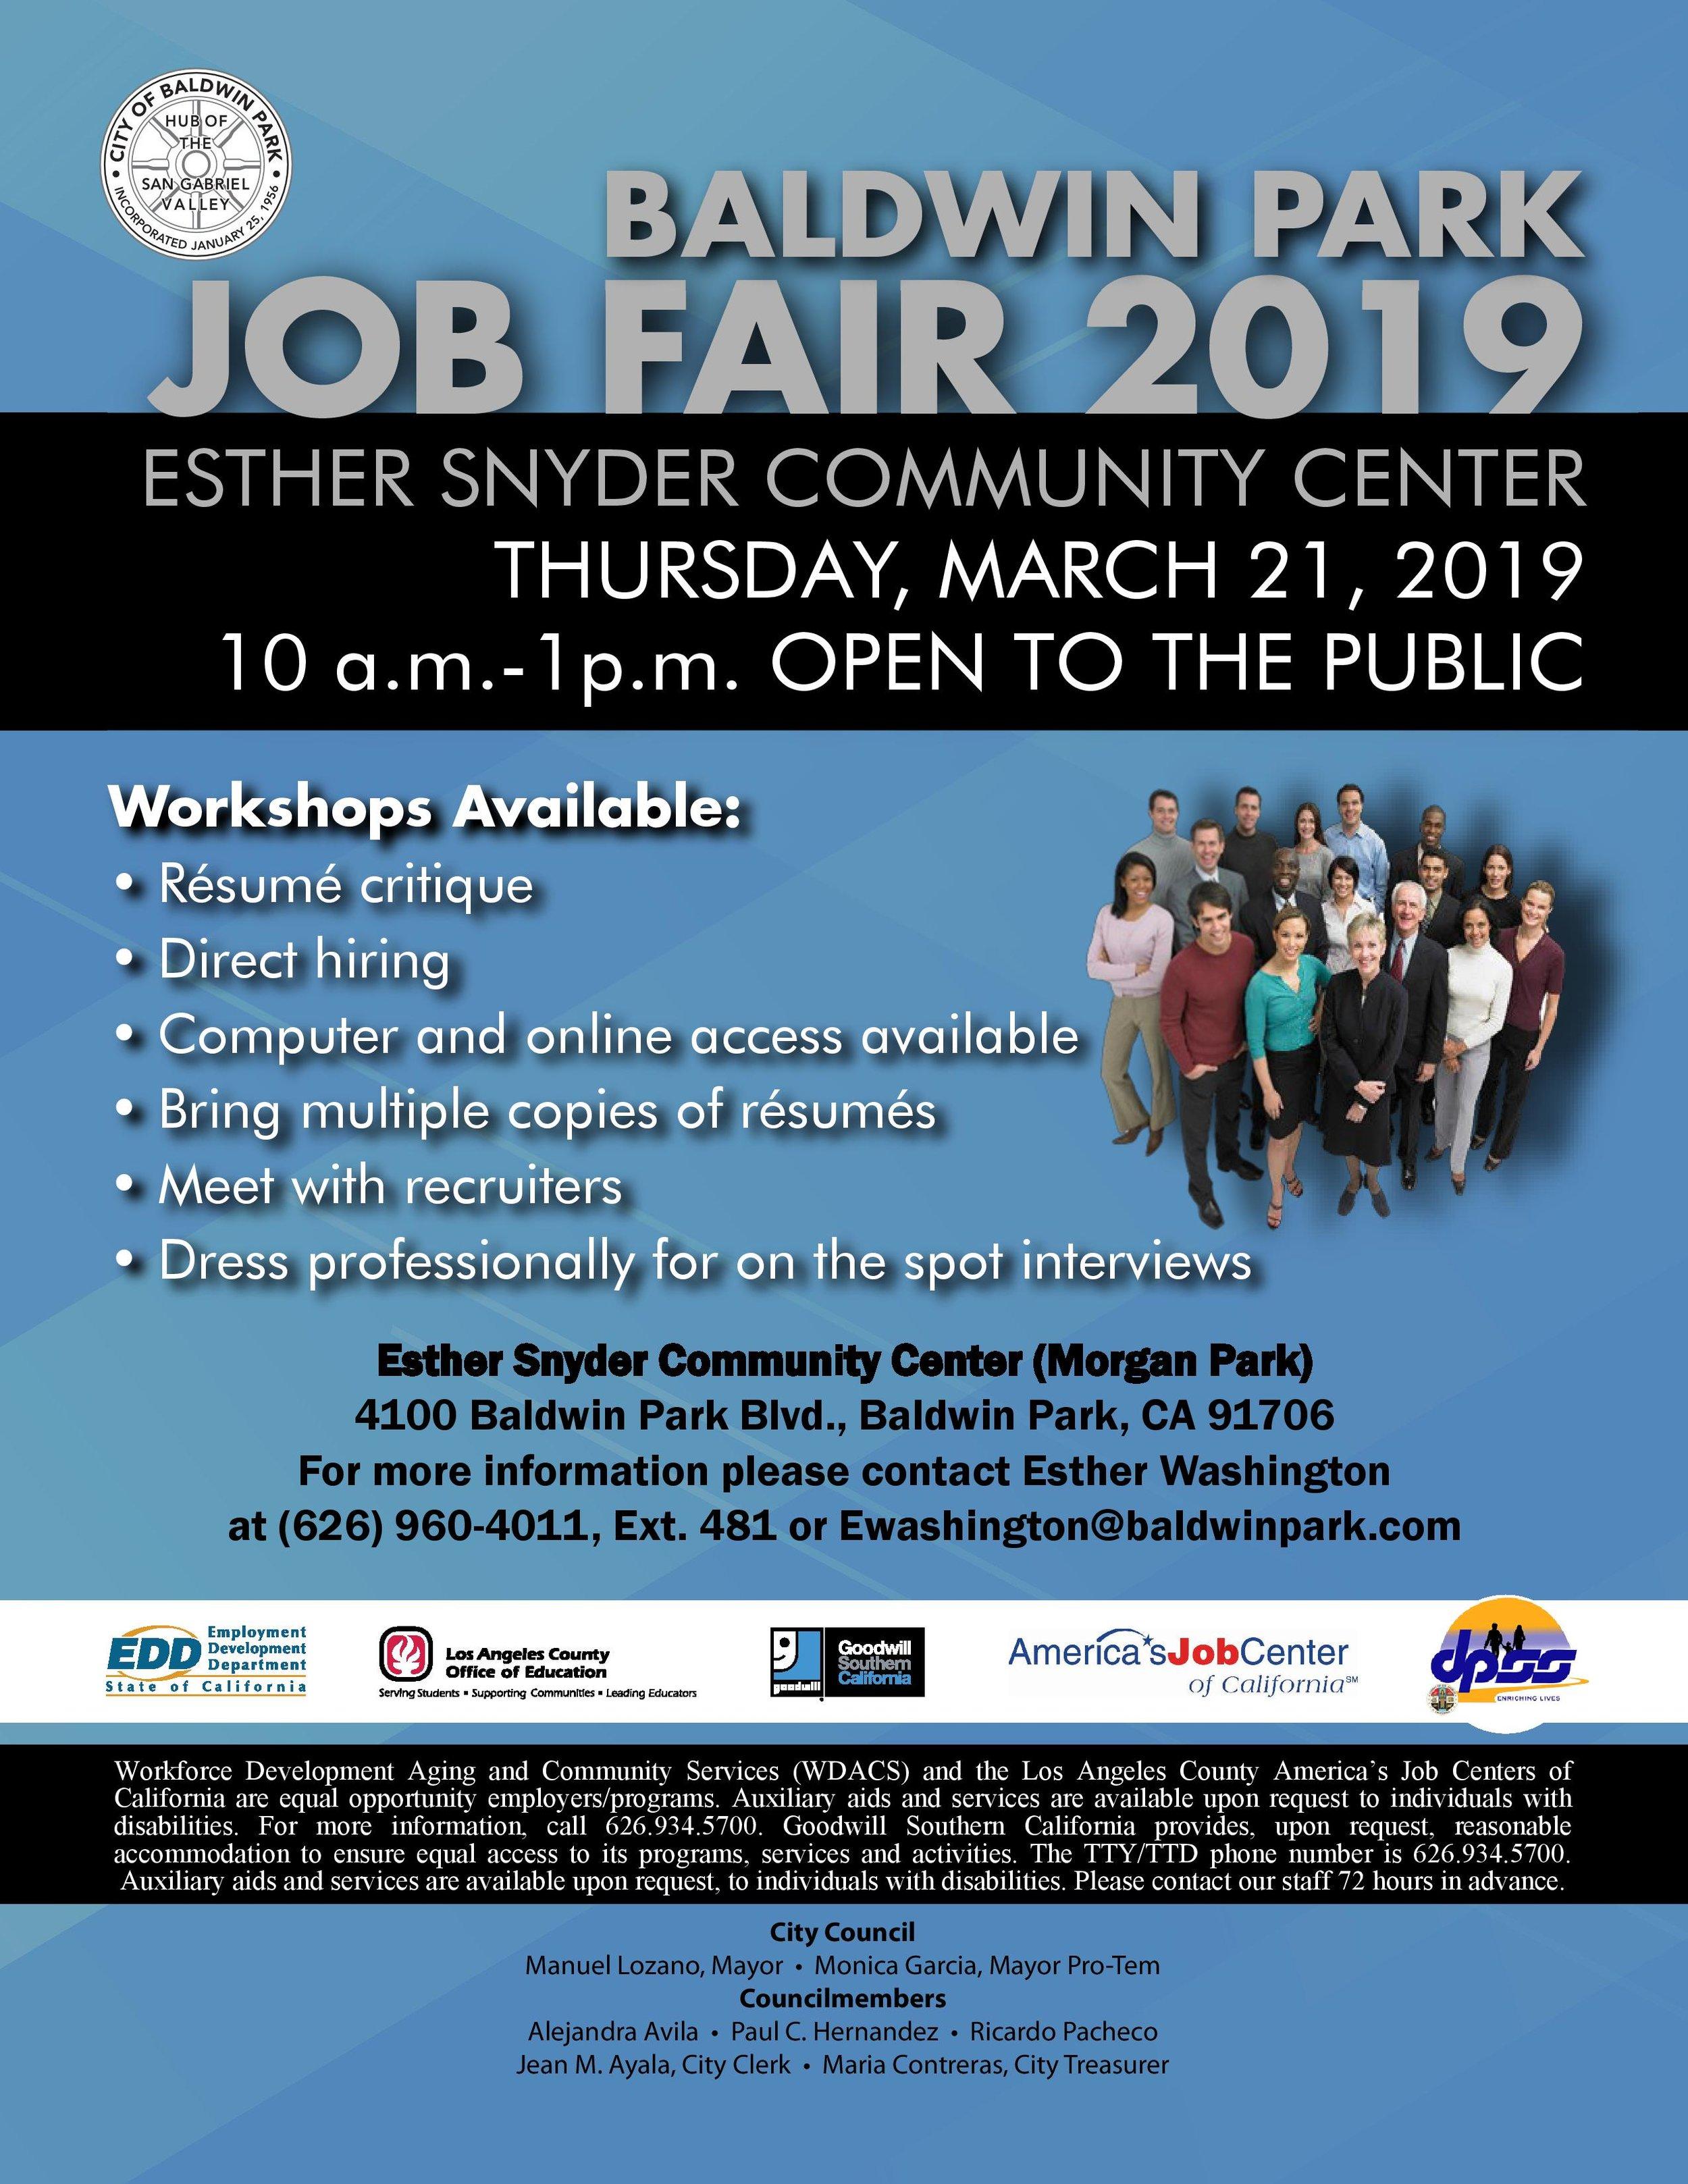 Baldwin park job fair 2019 - March 21st, 2019